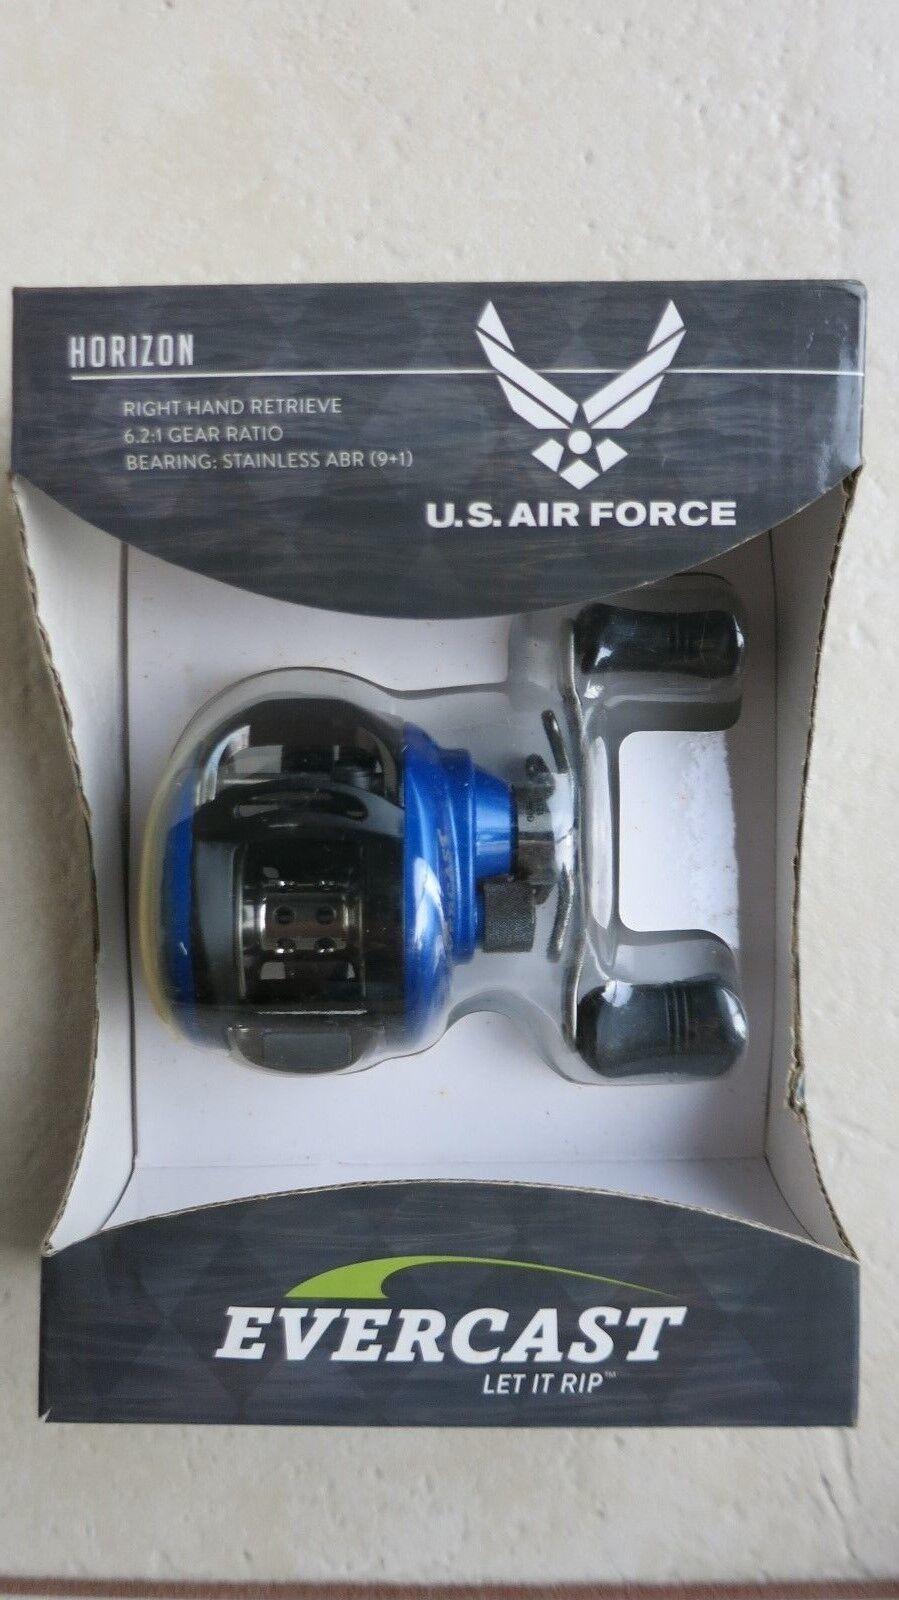 Evercast Horizon U.S. Air Force Fishing Reel blueE - Right Hand Retrieve 6.2 1